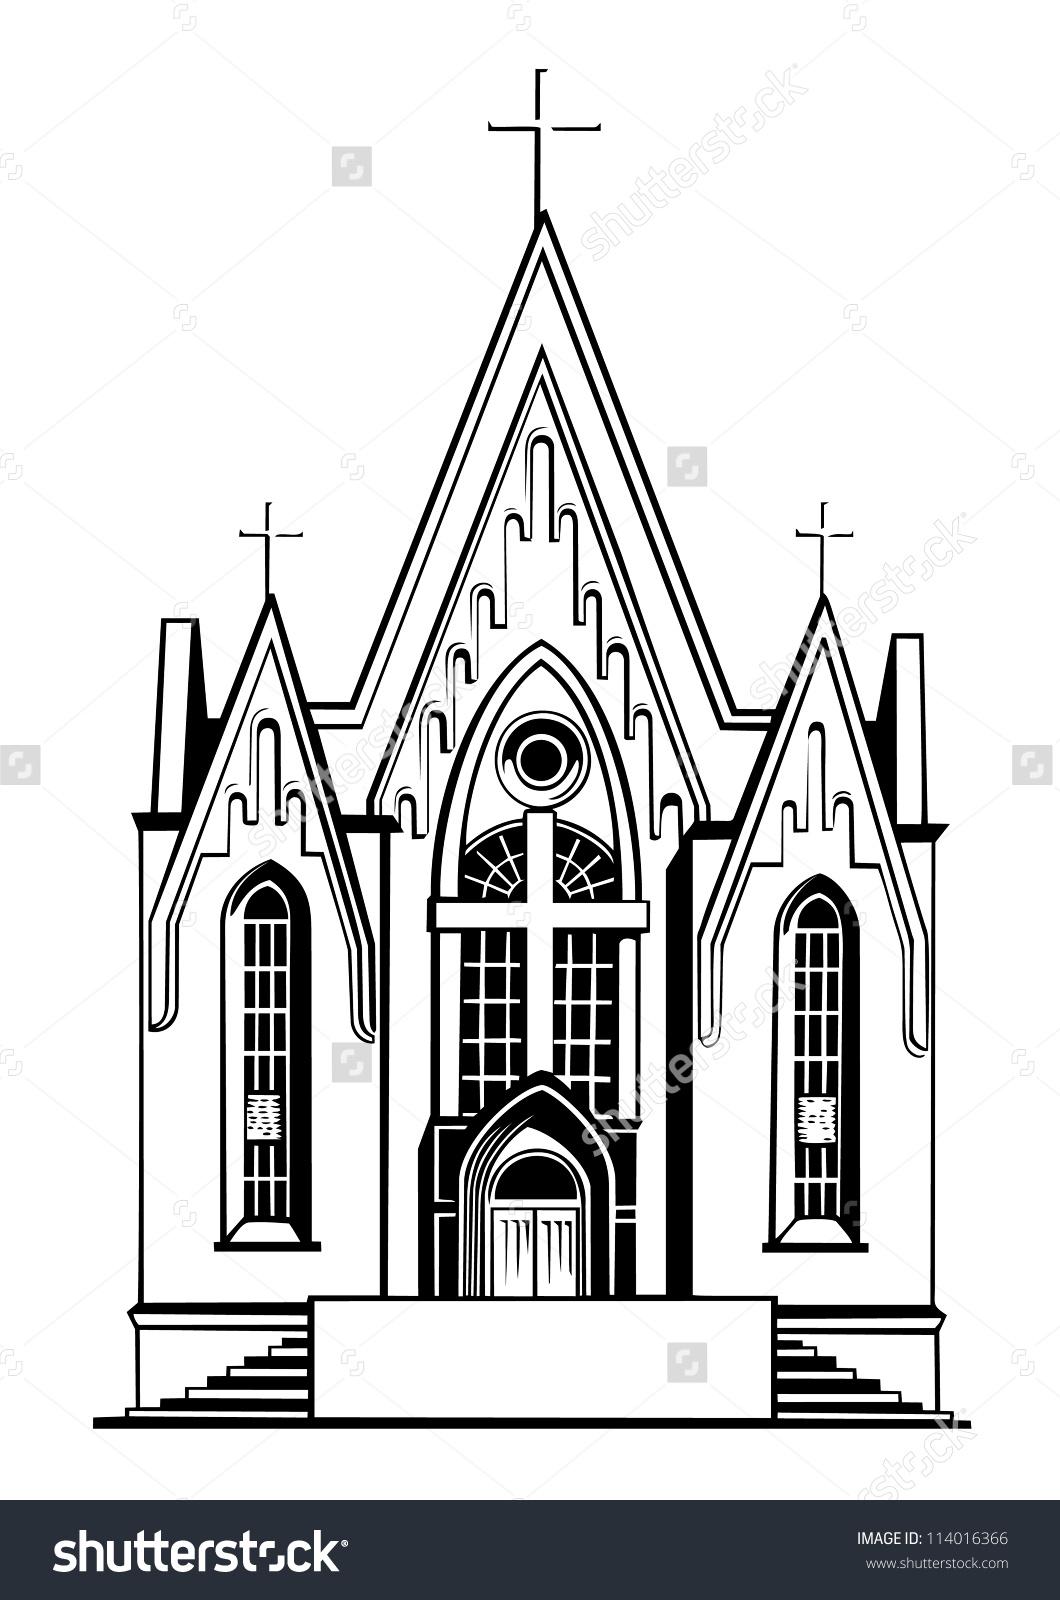 Holy spirit church clipart - Clipground